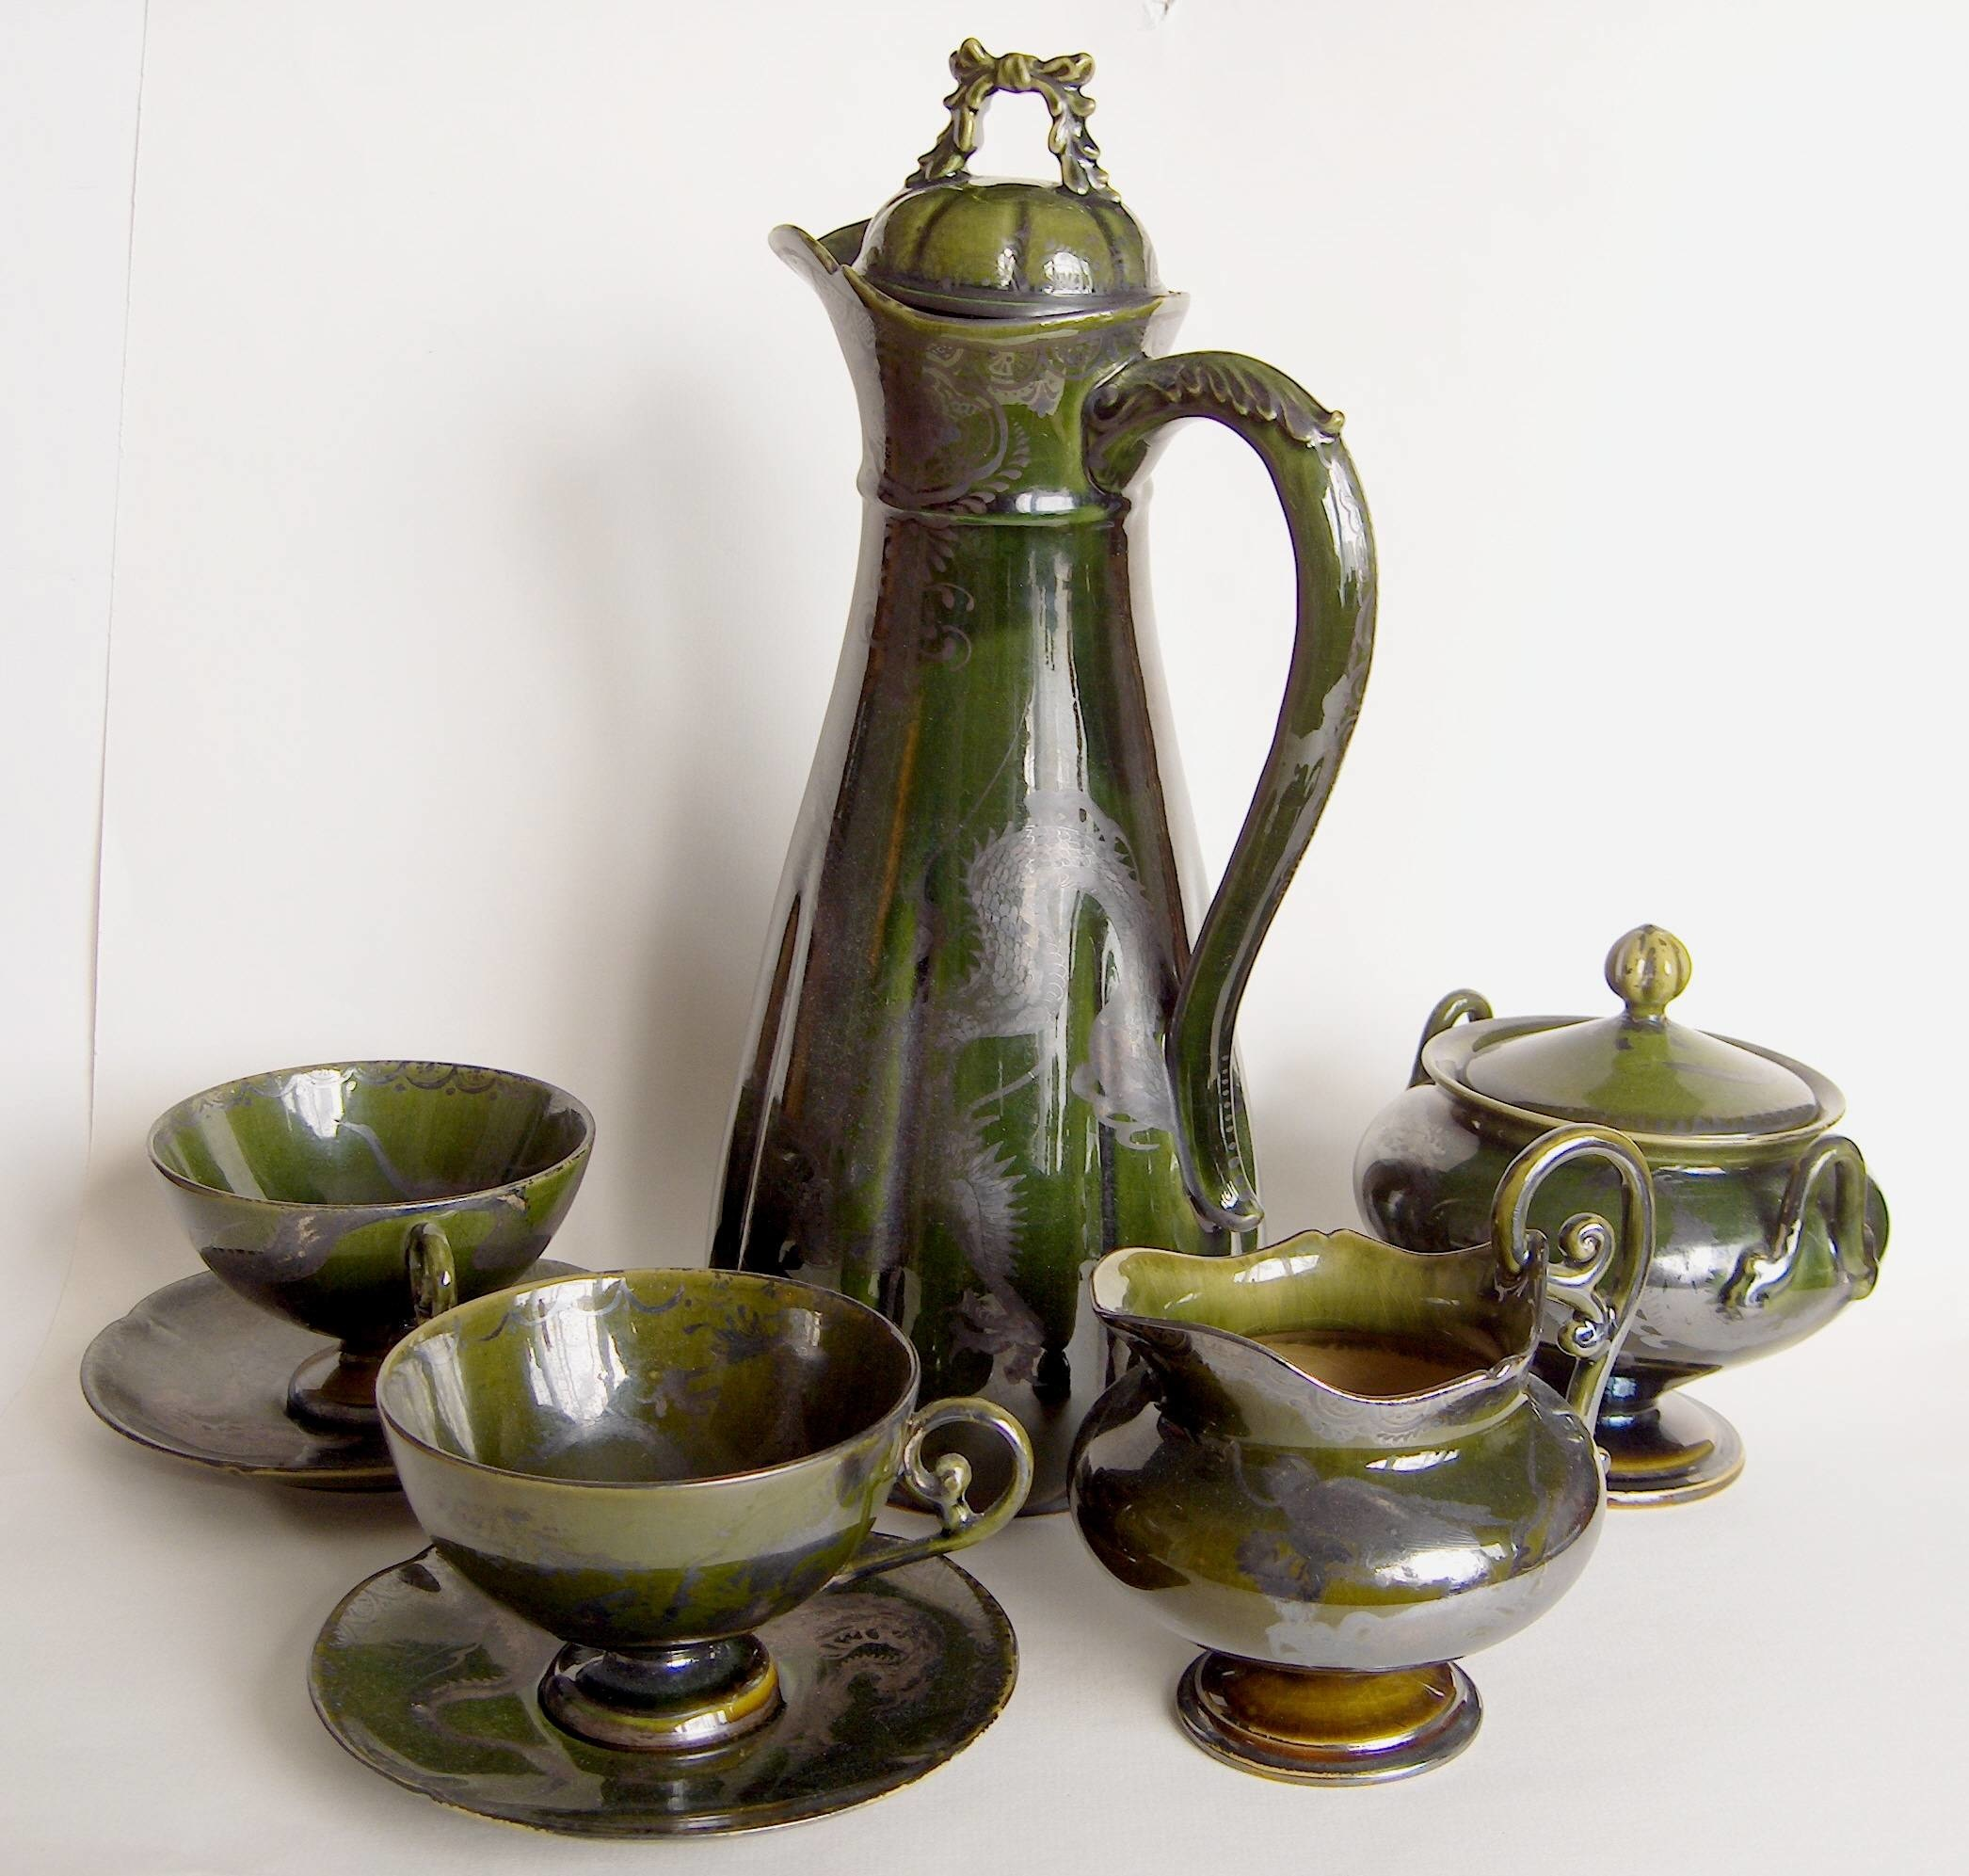 WAKAYAMA Japanese Pottery Company - Obscure antique purveyor